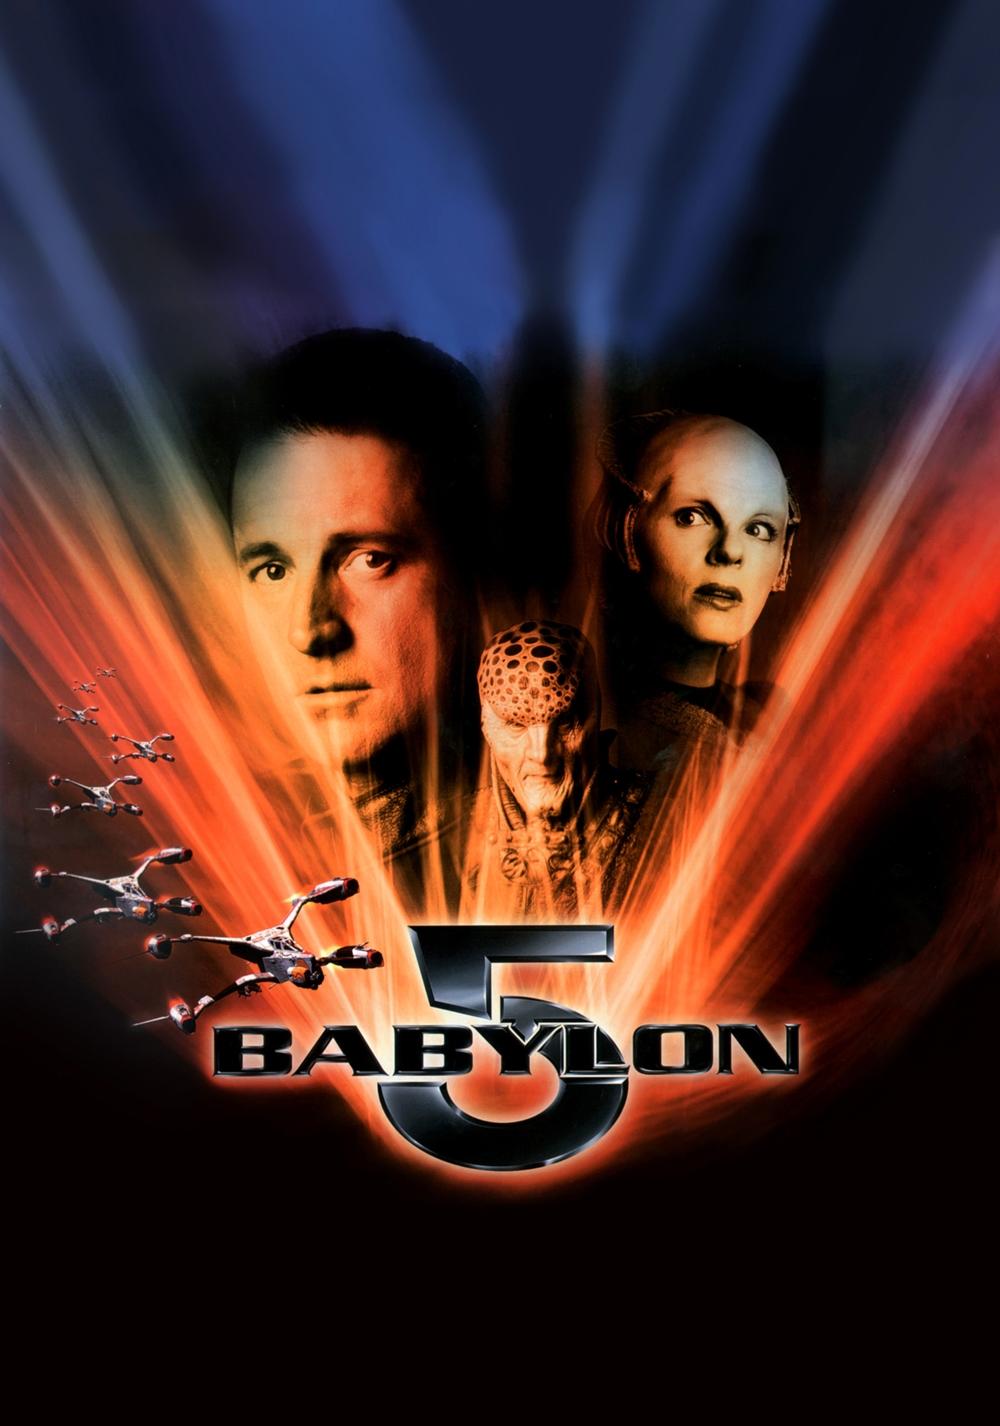 babylon 5 in the beginning movie fanart fanarttv